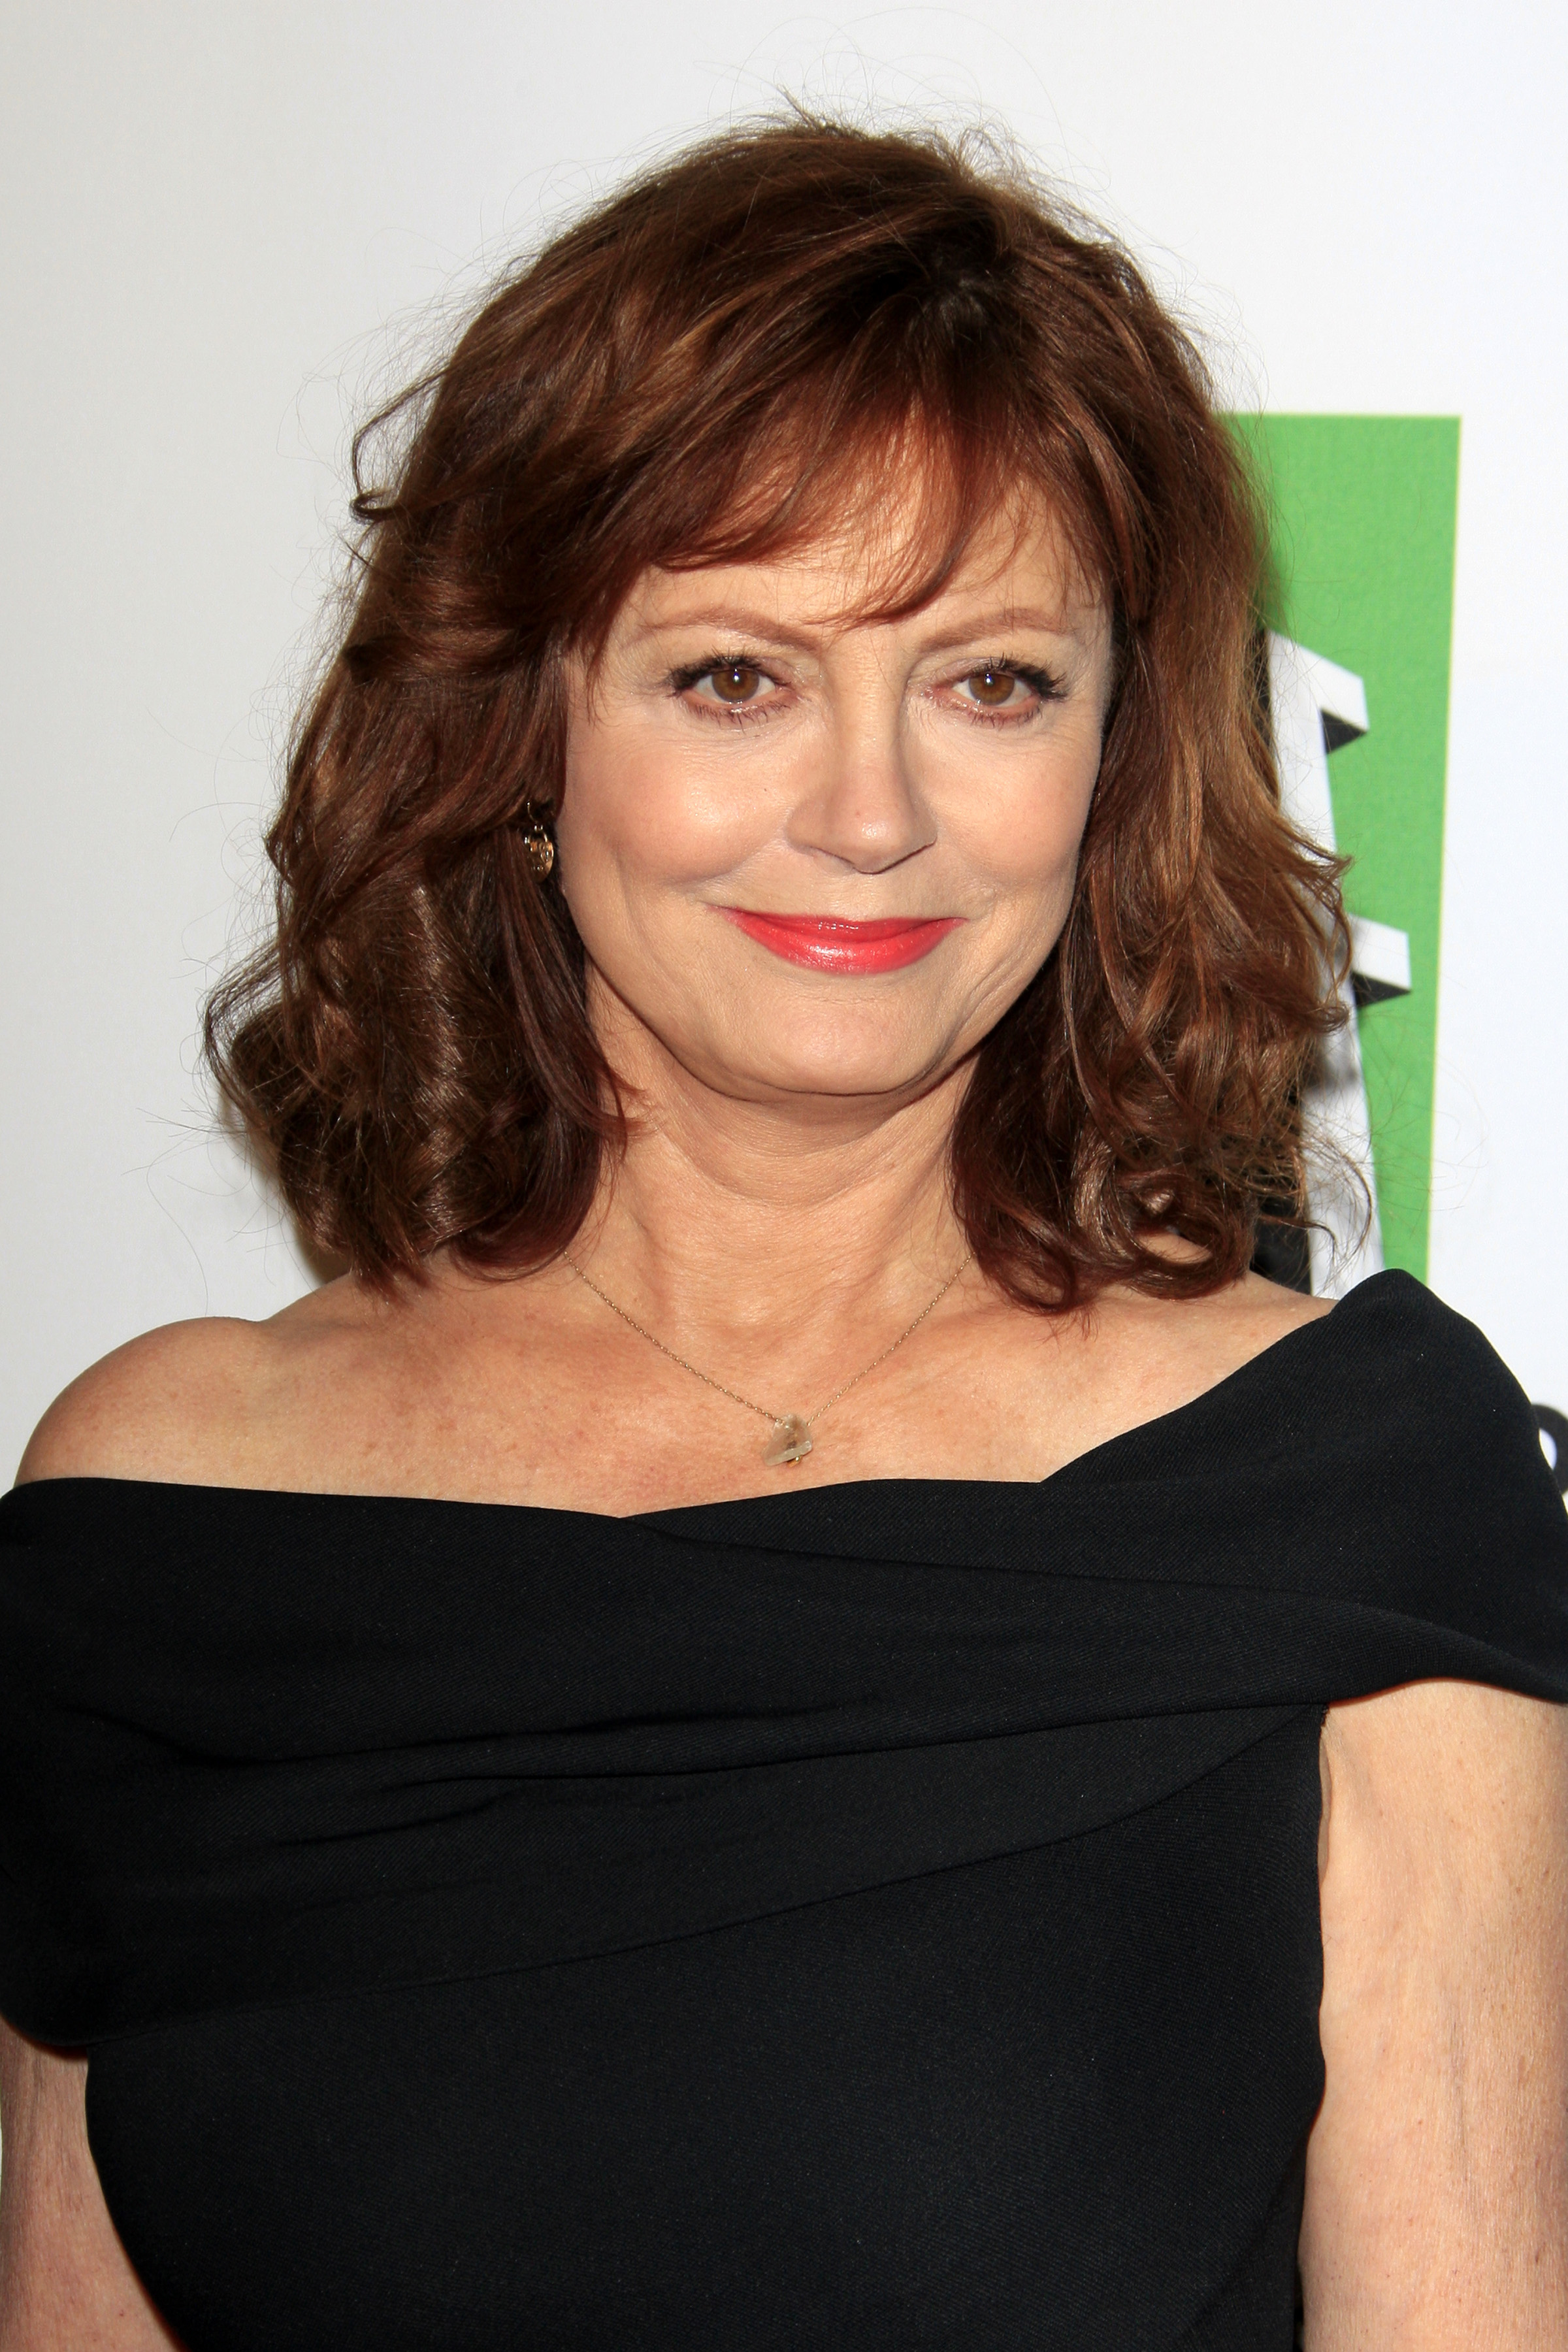 Susan Sarandon - Rebecca